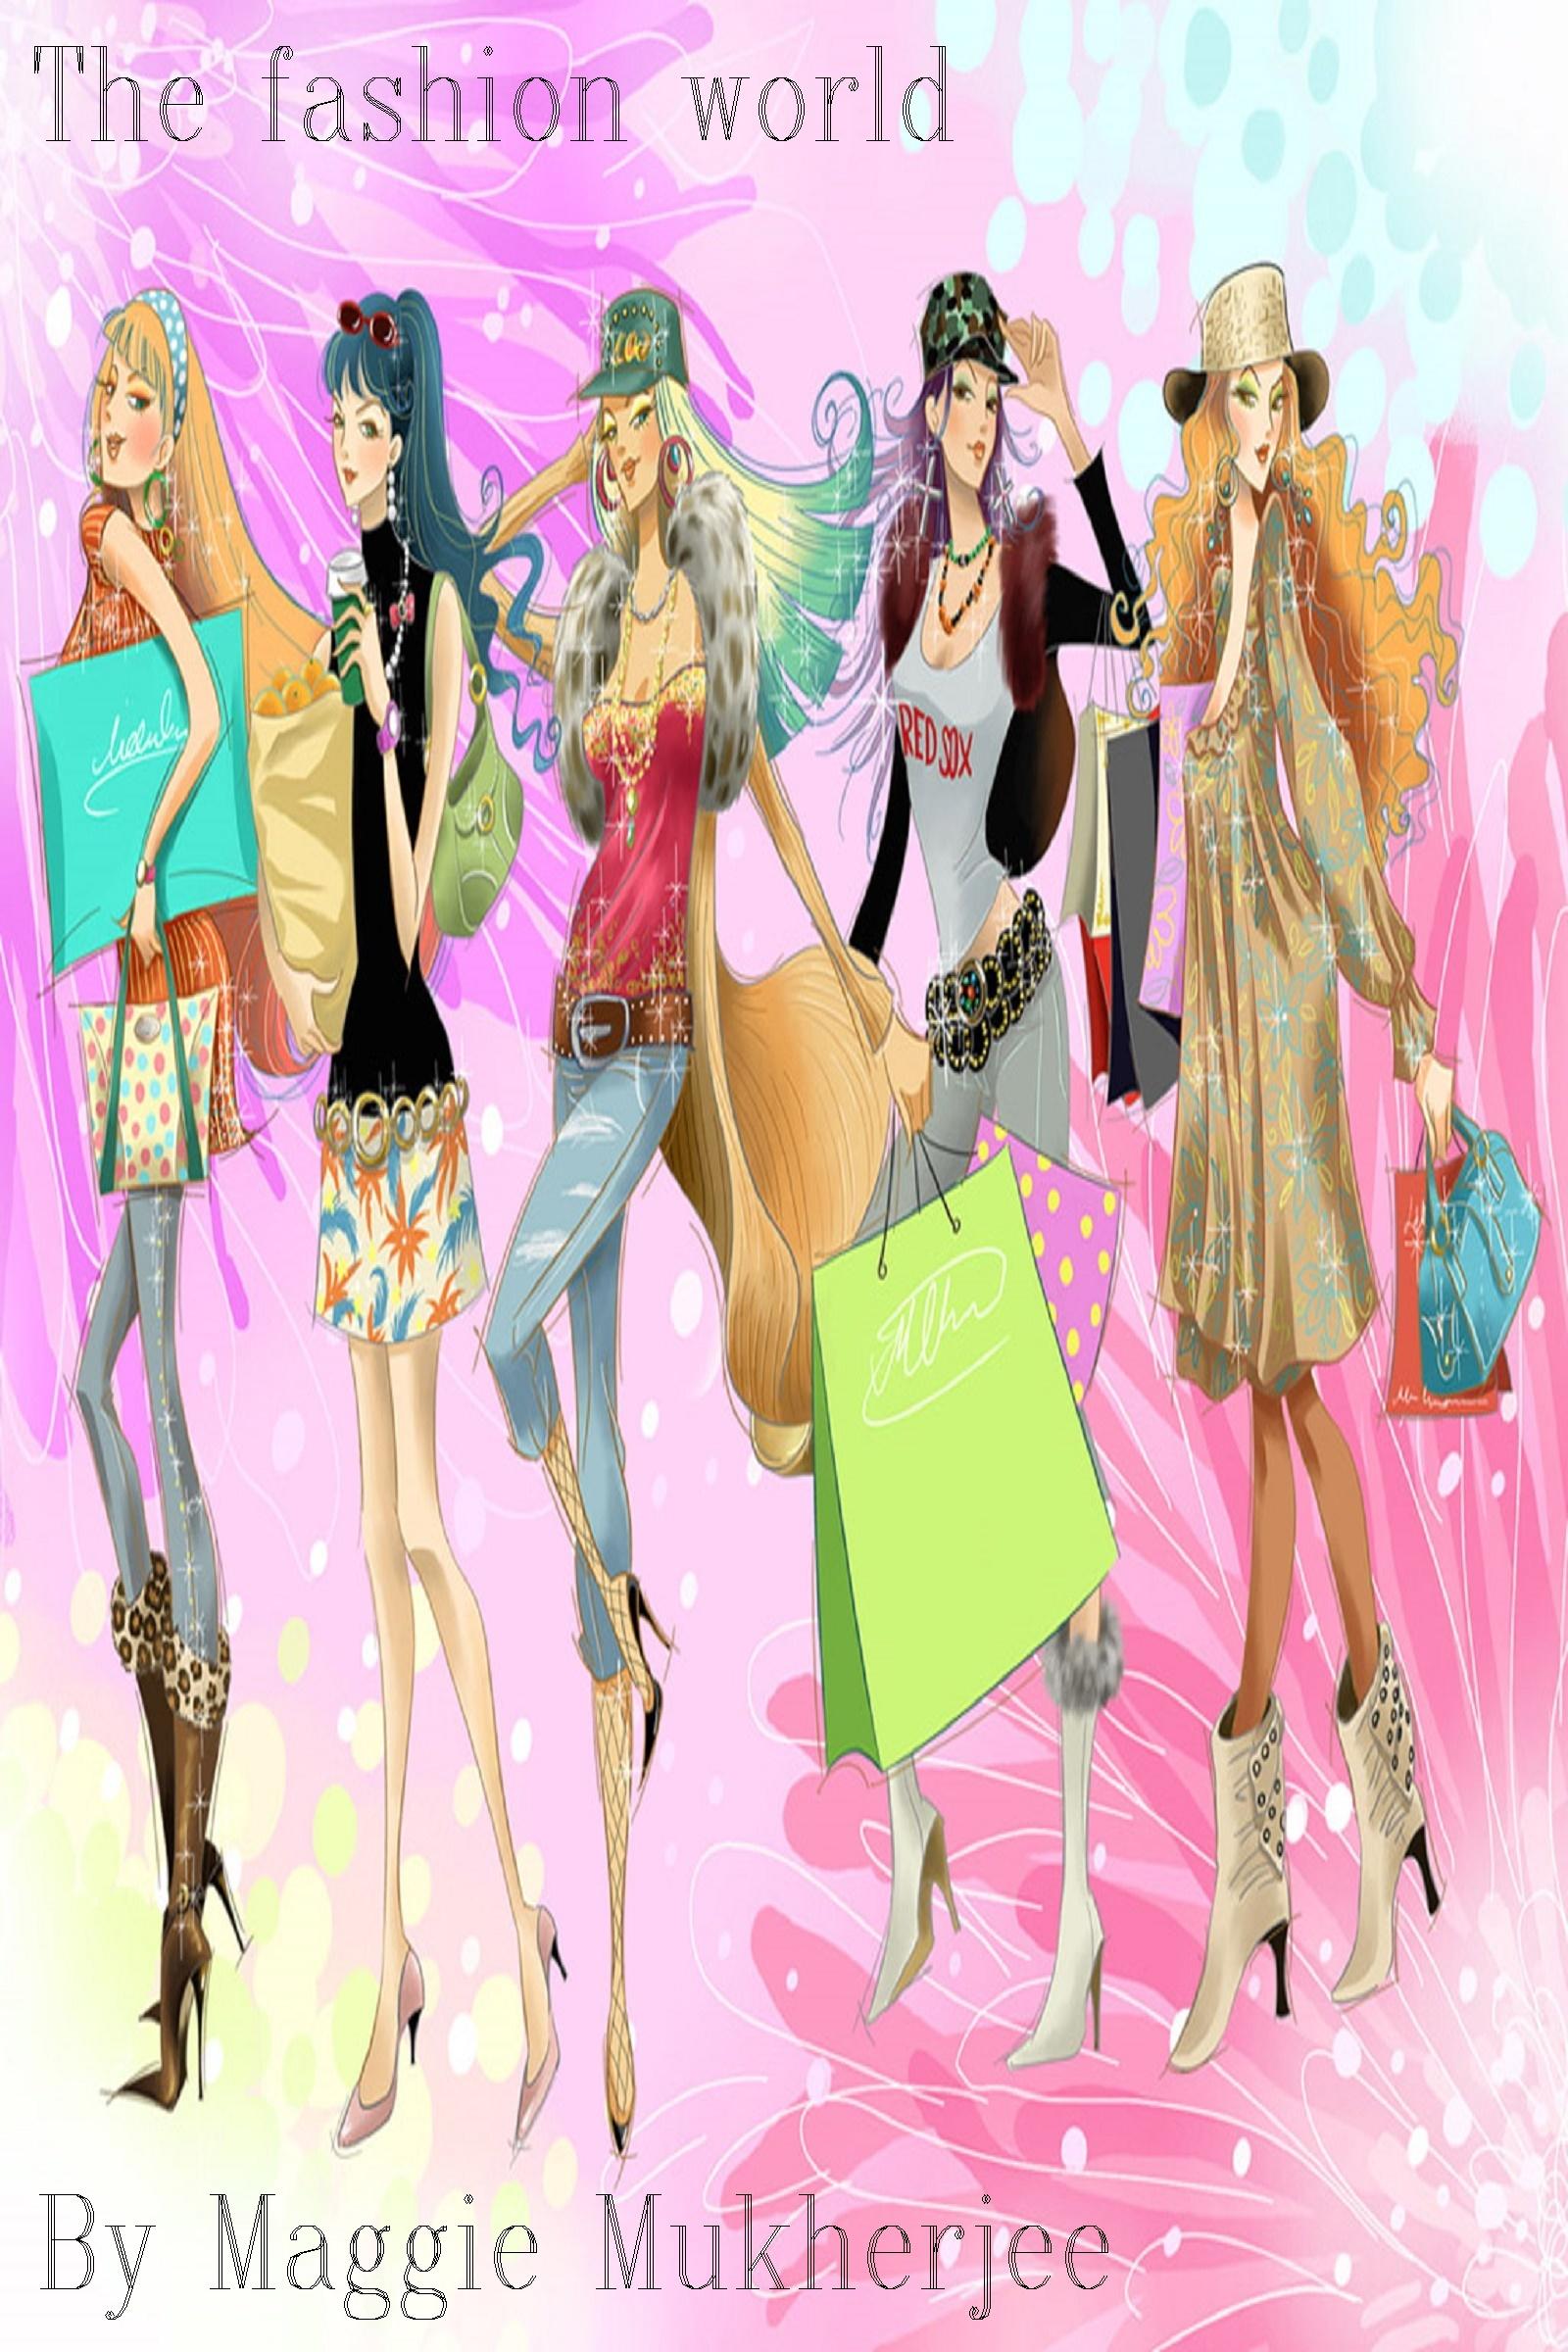 Smashwords The Fashion World A Book By Maggie Mukherjee